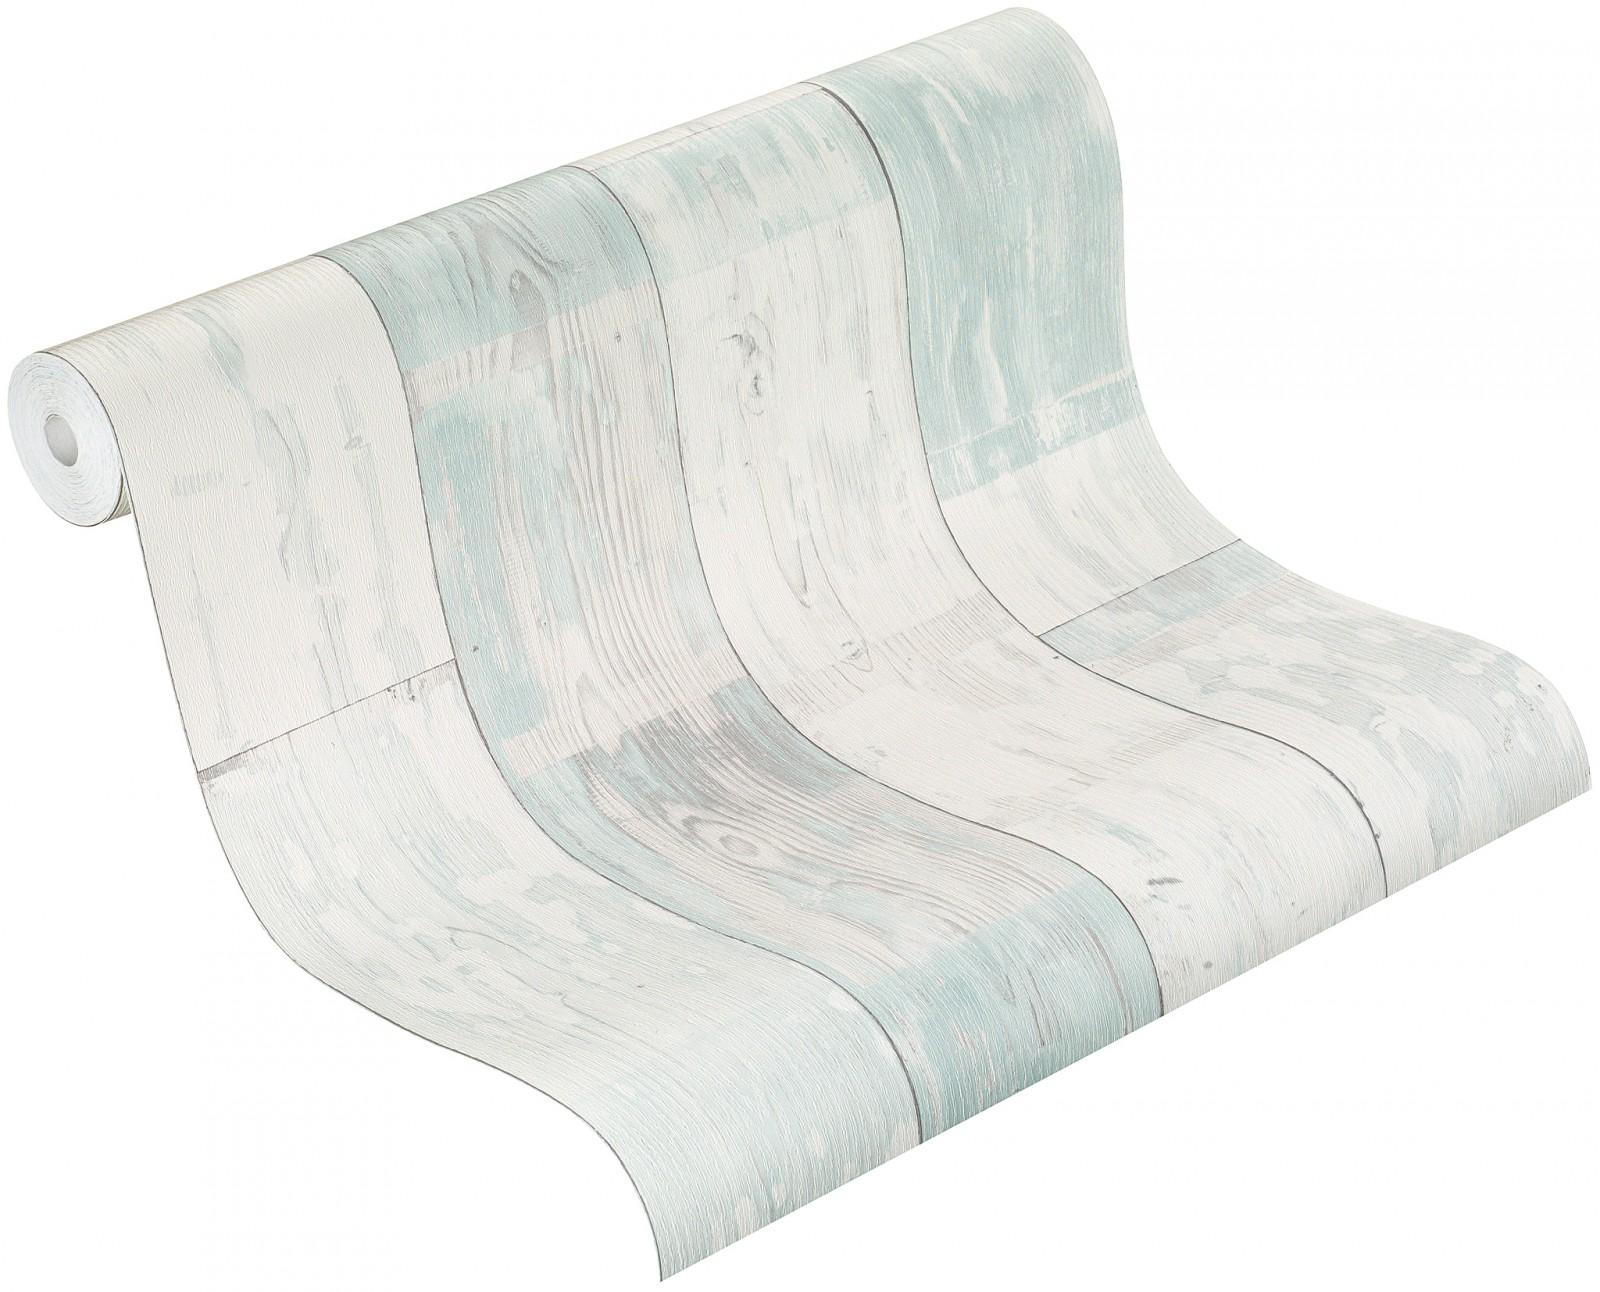 rasch vliestapete 587135 bestseller holz optik creme wei t rkis tapeten marken billigerluxus. Black Bedroom Furniture Sets. Home Design Ideas